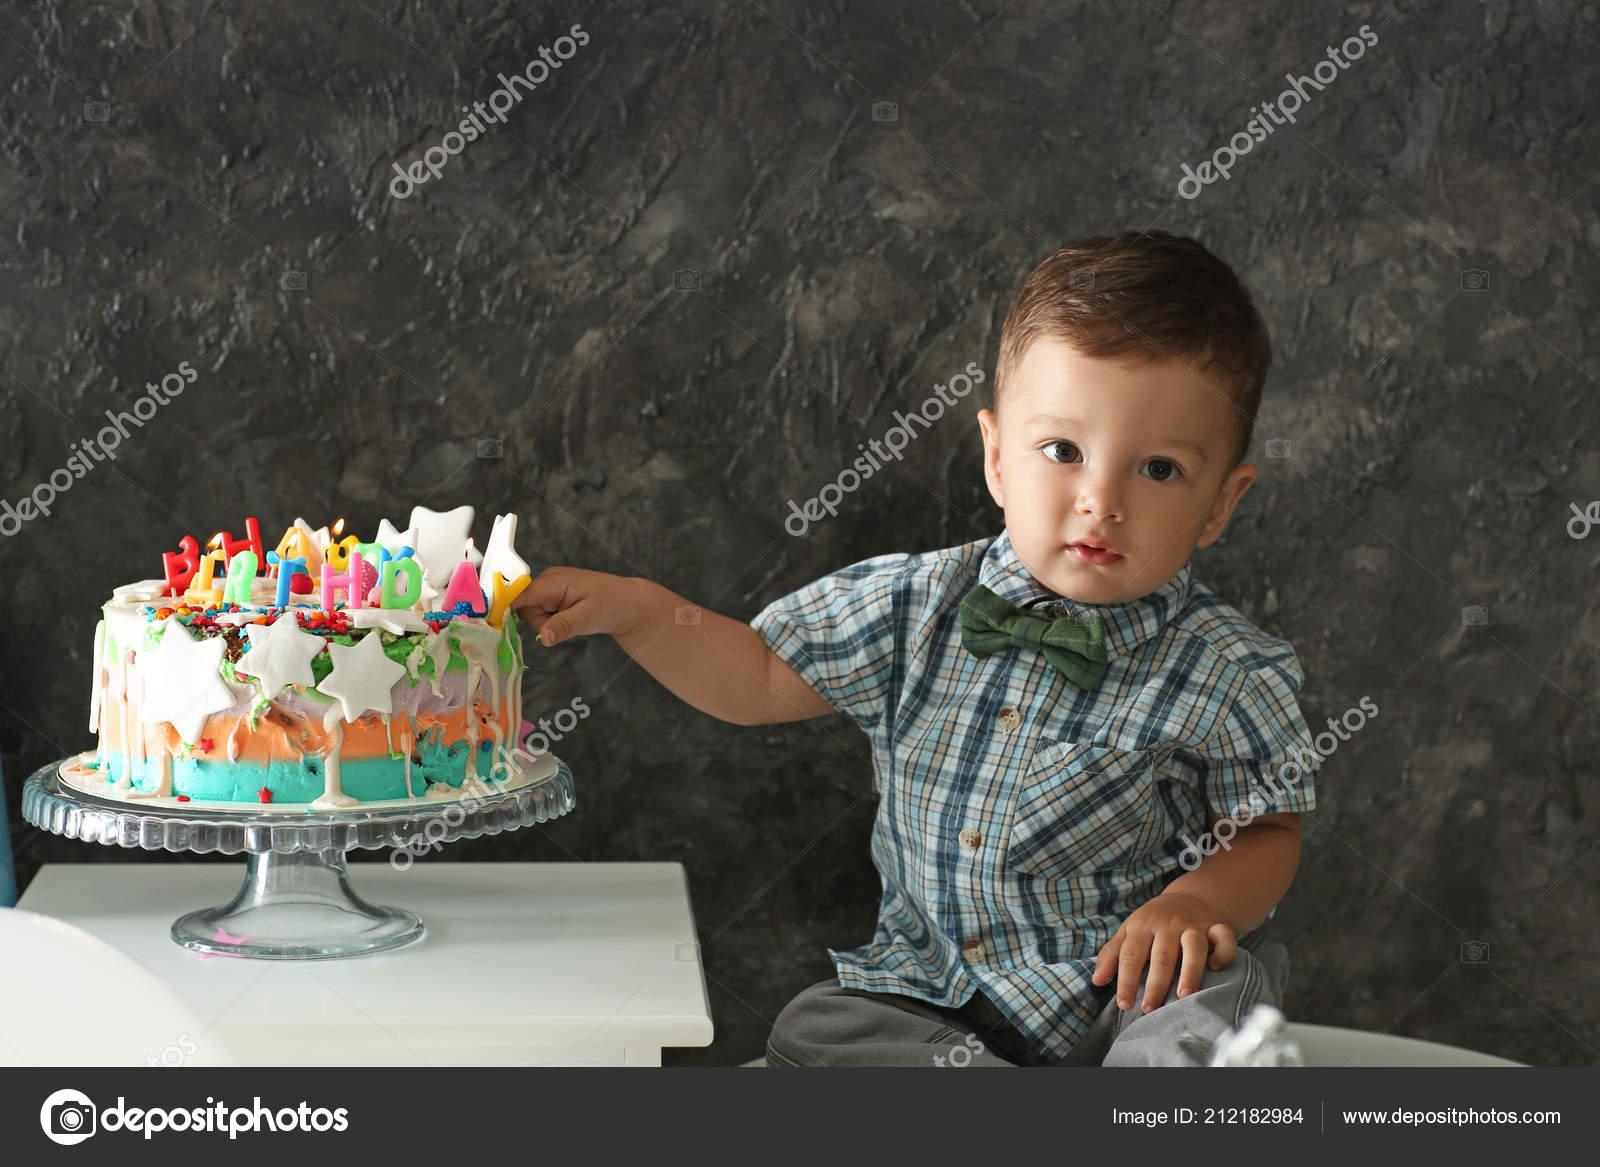 Awe Inspiring Cute Little Boy Birthday Cake Grey Wall Stock Photo C Serezniy Birthday Cards Printable Nowaargucafe Filternl